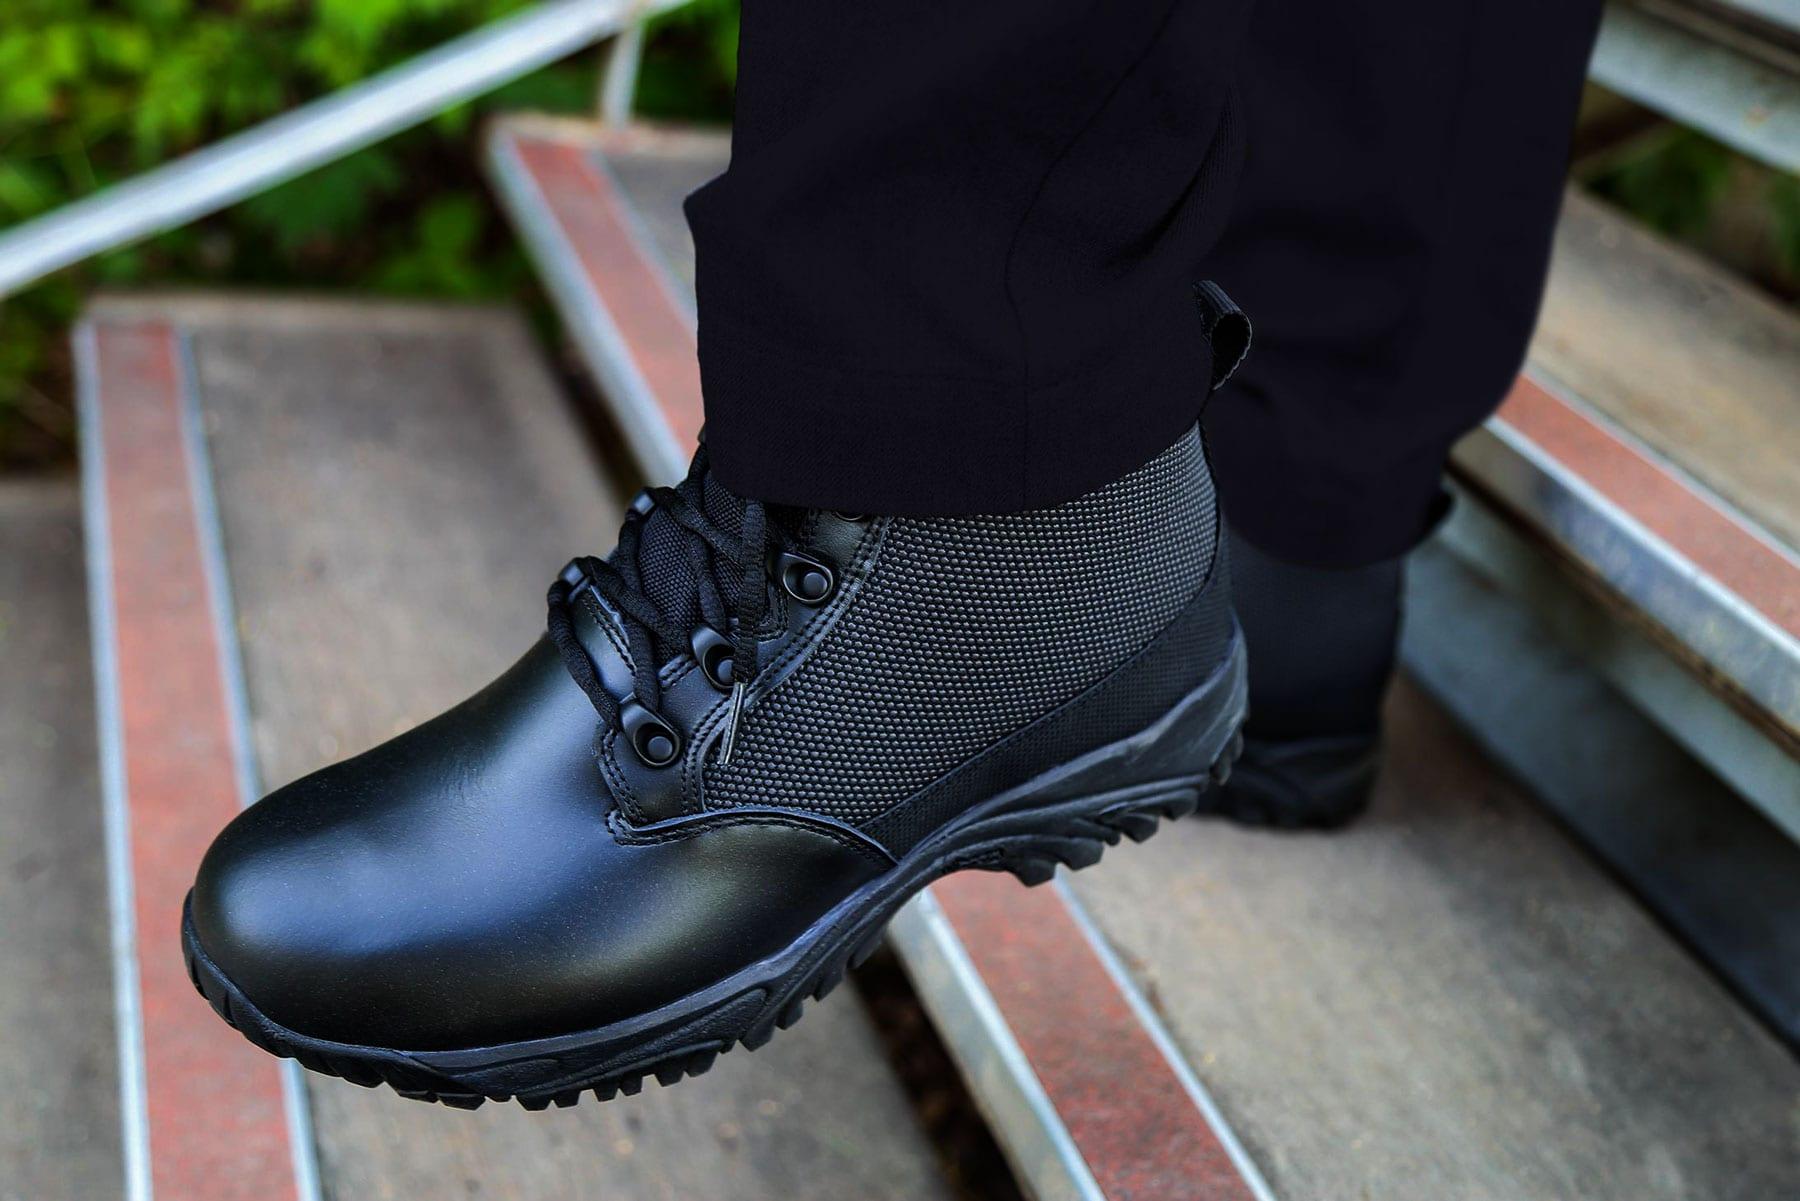 ALTAI Uniform Boots